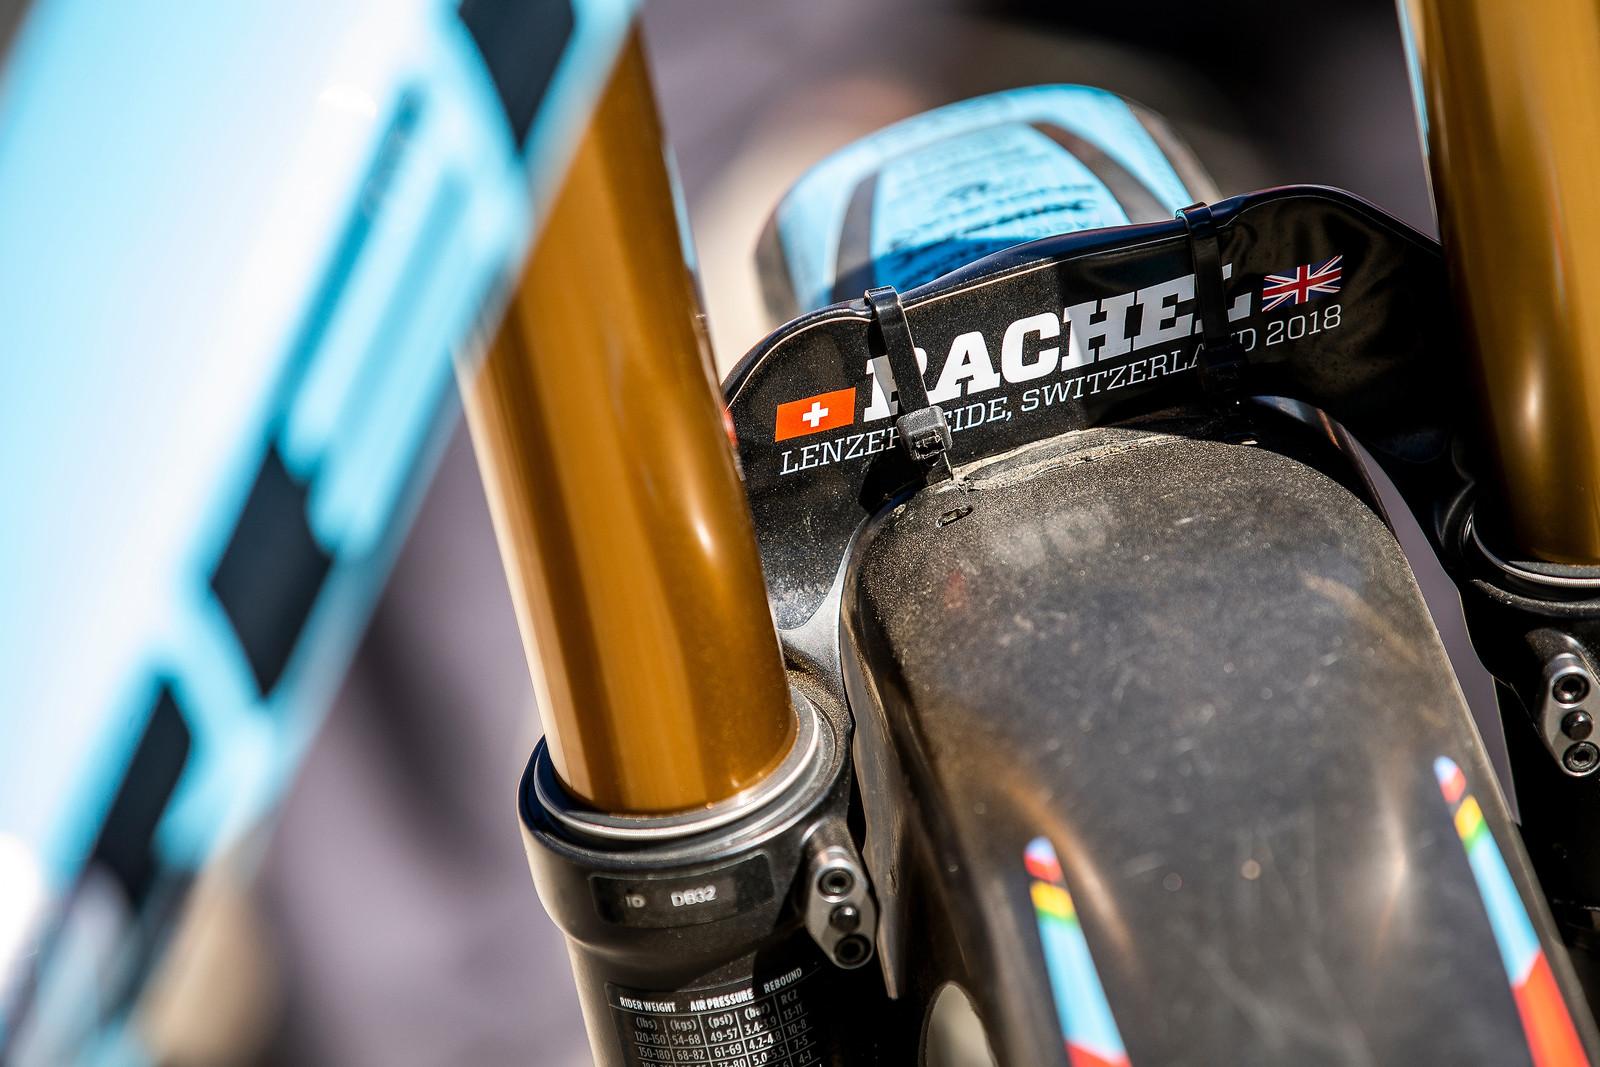 Winning Doesn't Ache at All - WINNING BIKE - Rachel Atherton's Trek Session - Mountain Biking Pictures - Vital MTB